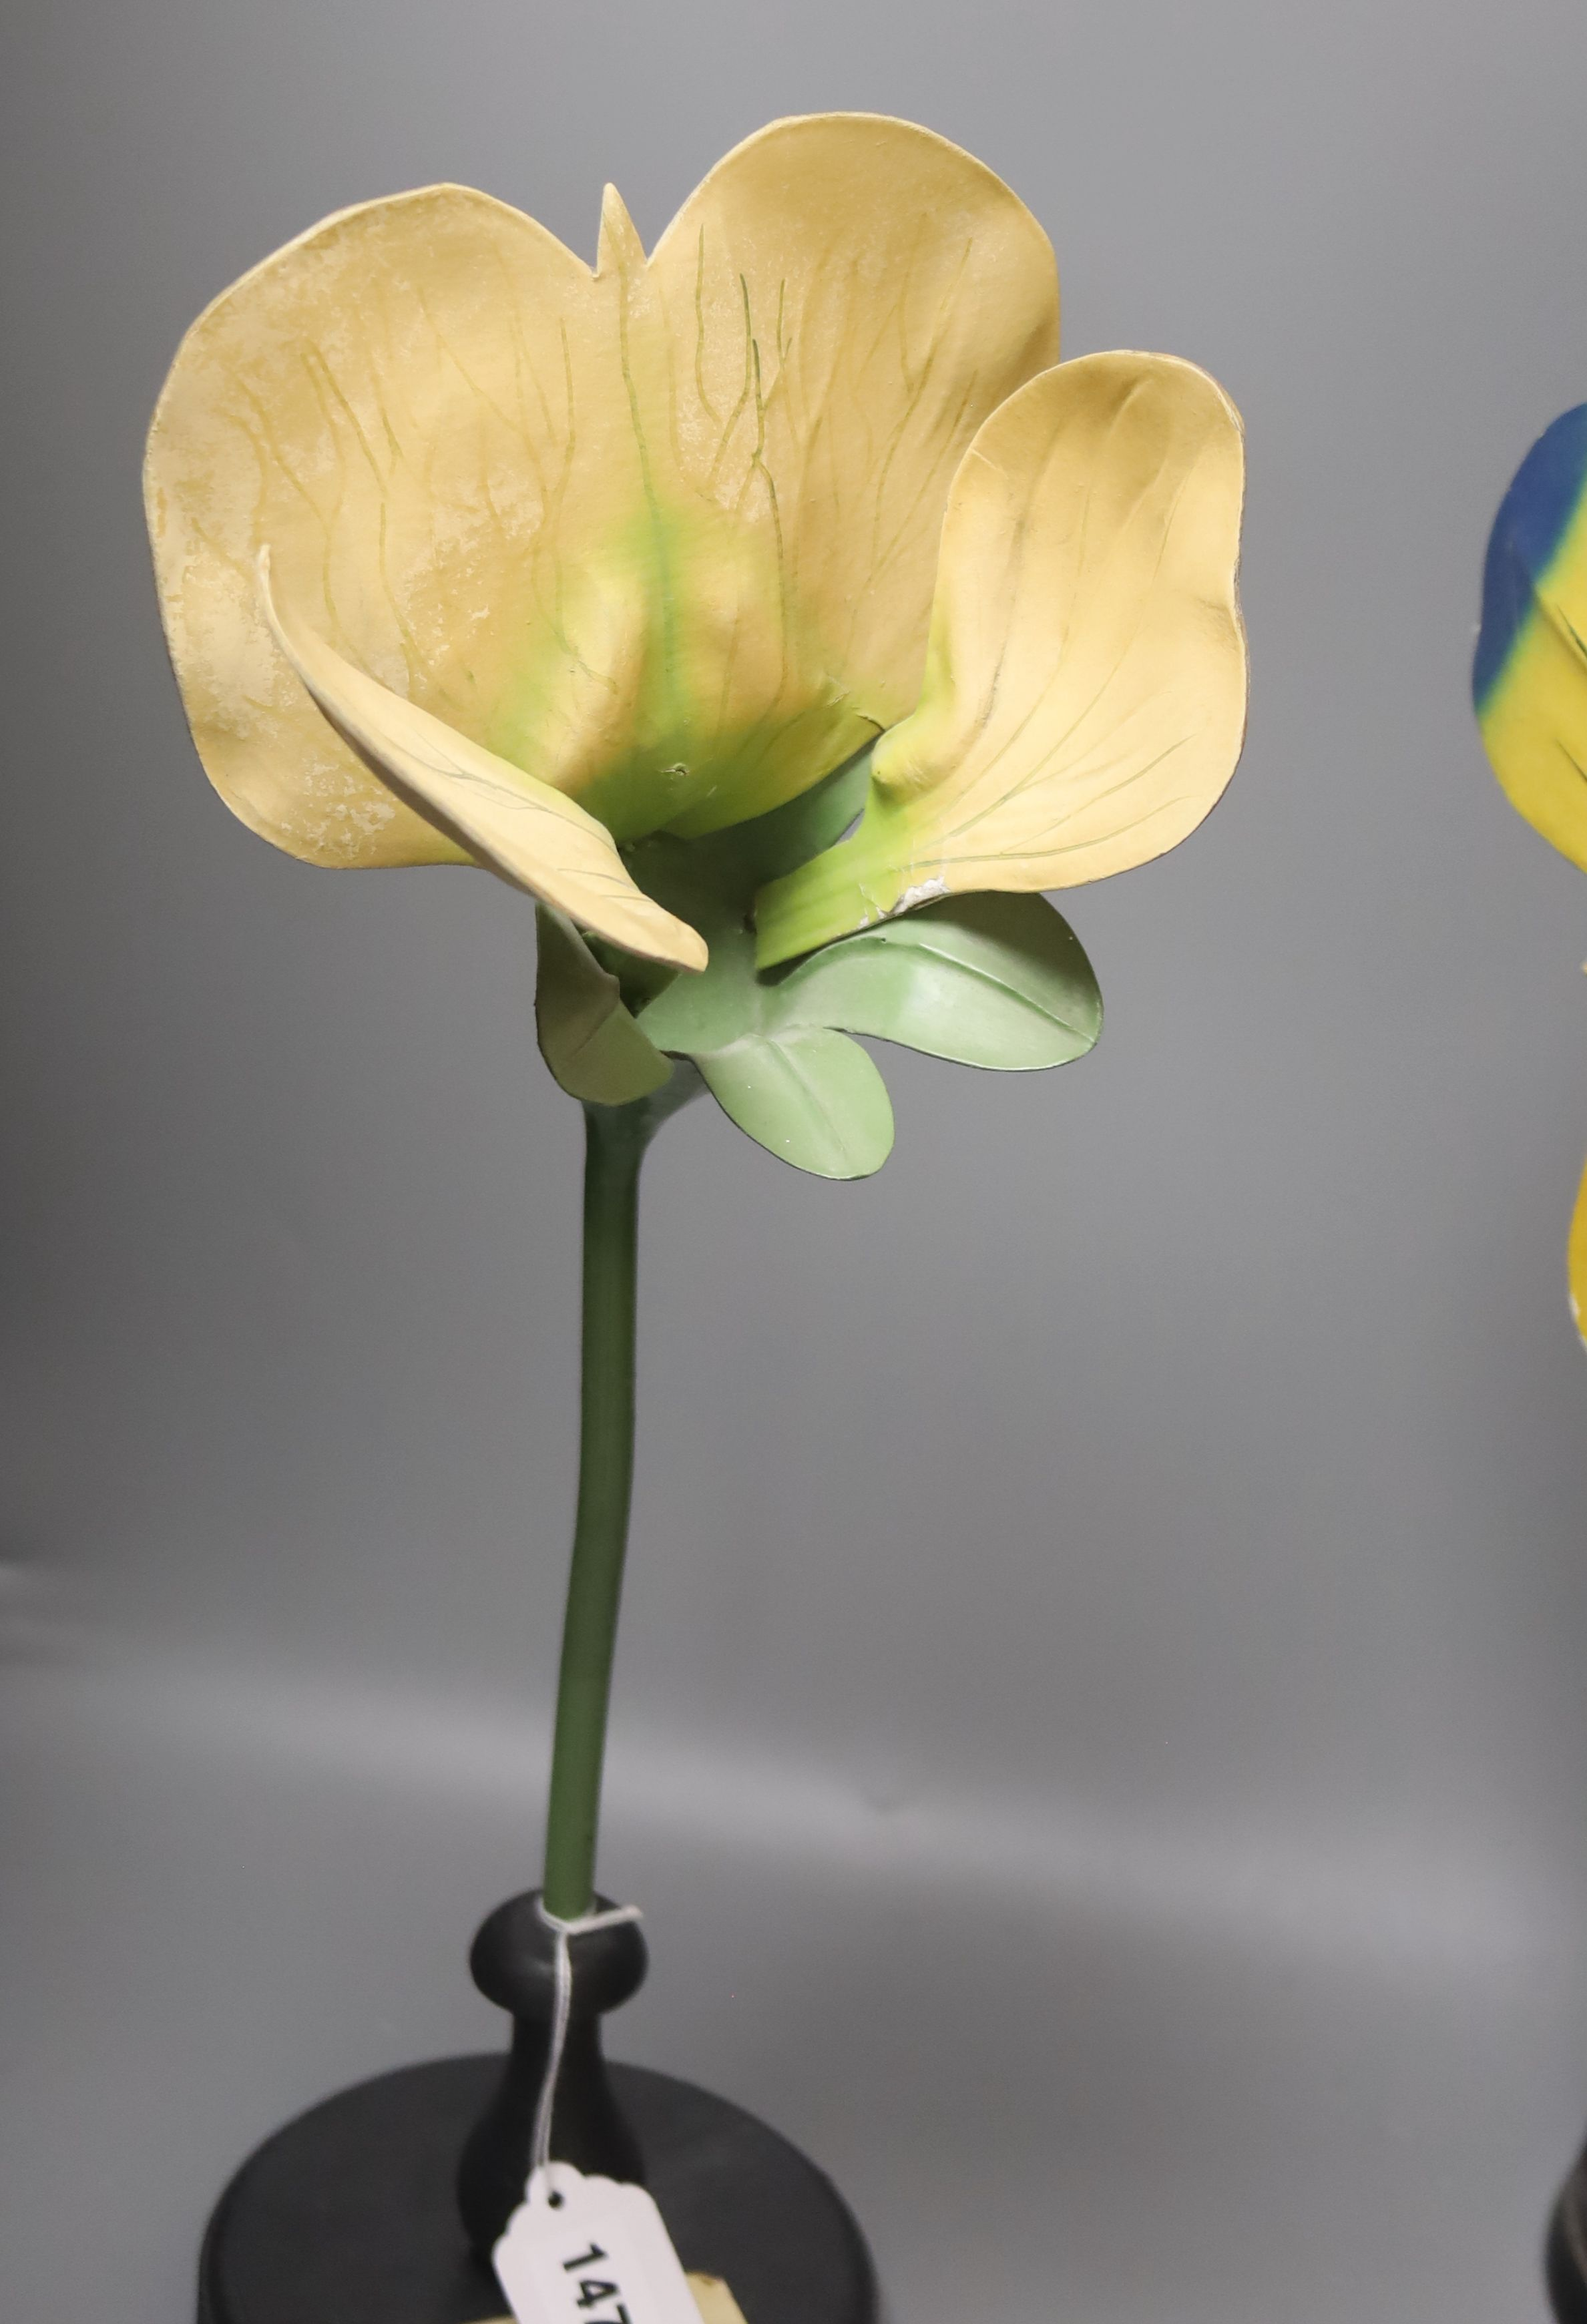 A Group of four 20th century German Brendel botanical specimen / teaching models, Pisum Pois - Image 5 of 5